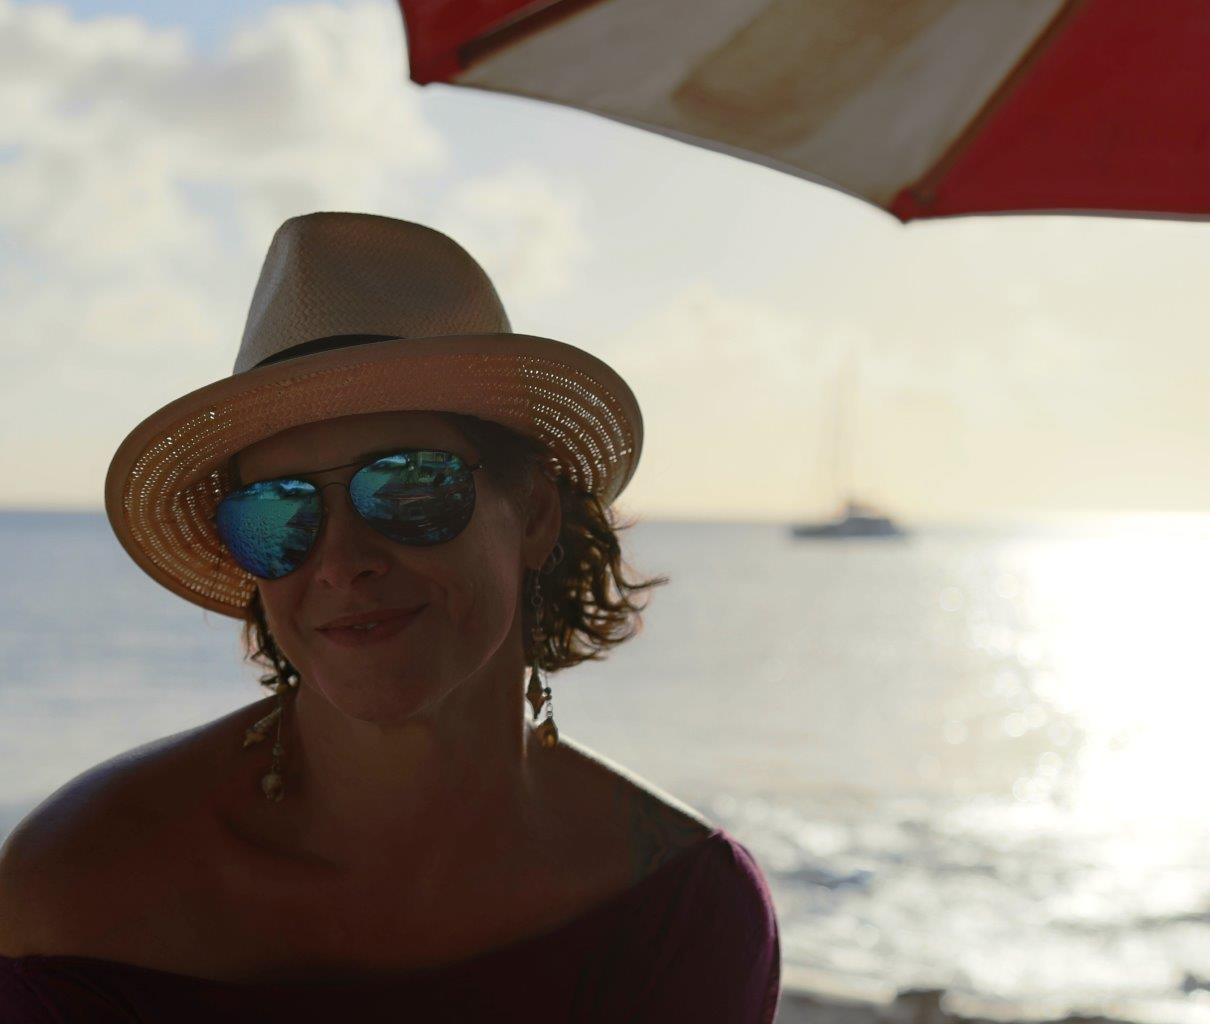 Enjoying a sundowner at Freedom City Surf Shop